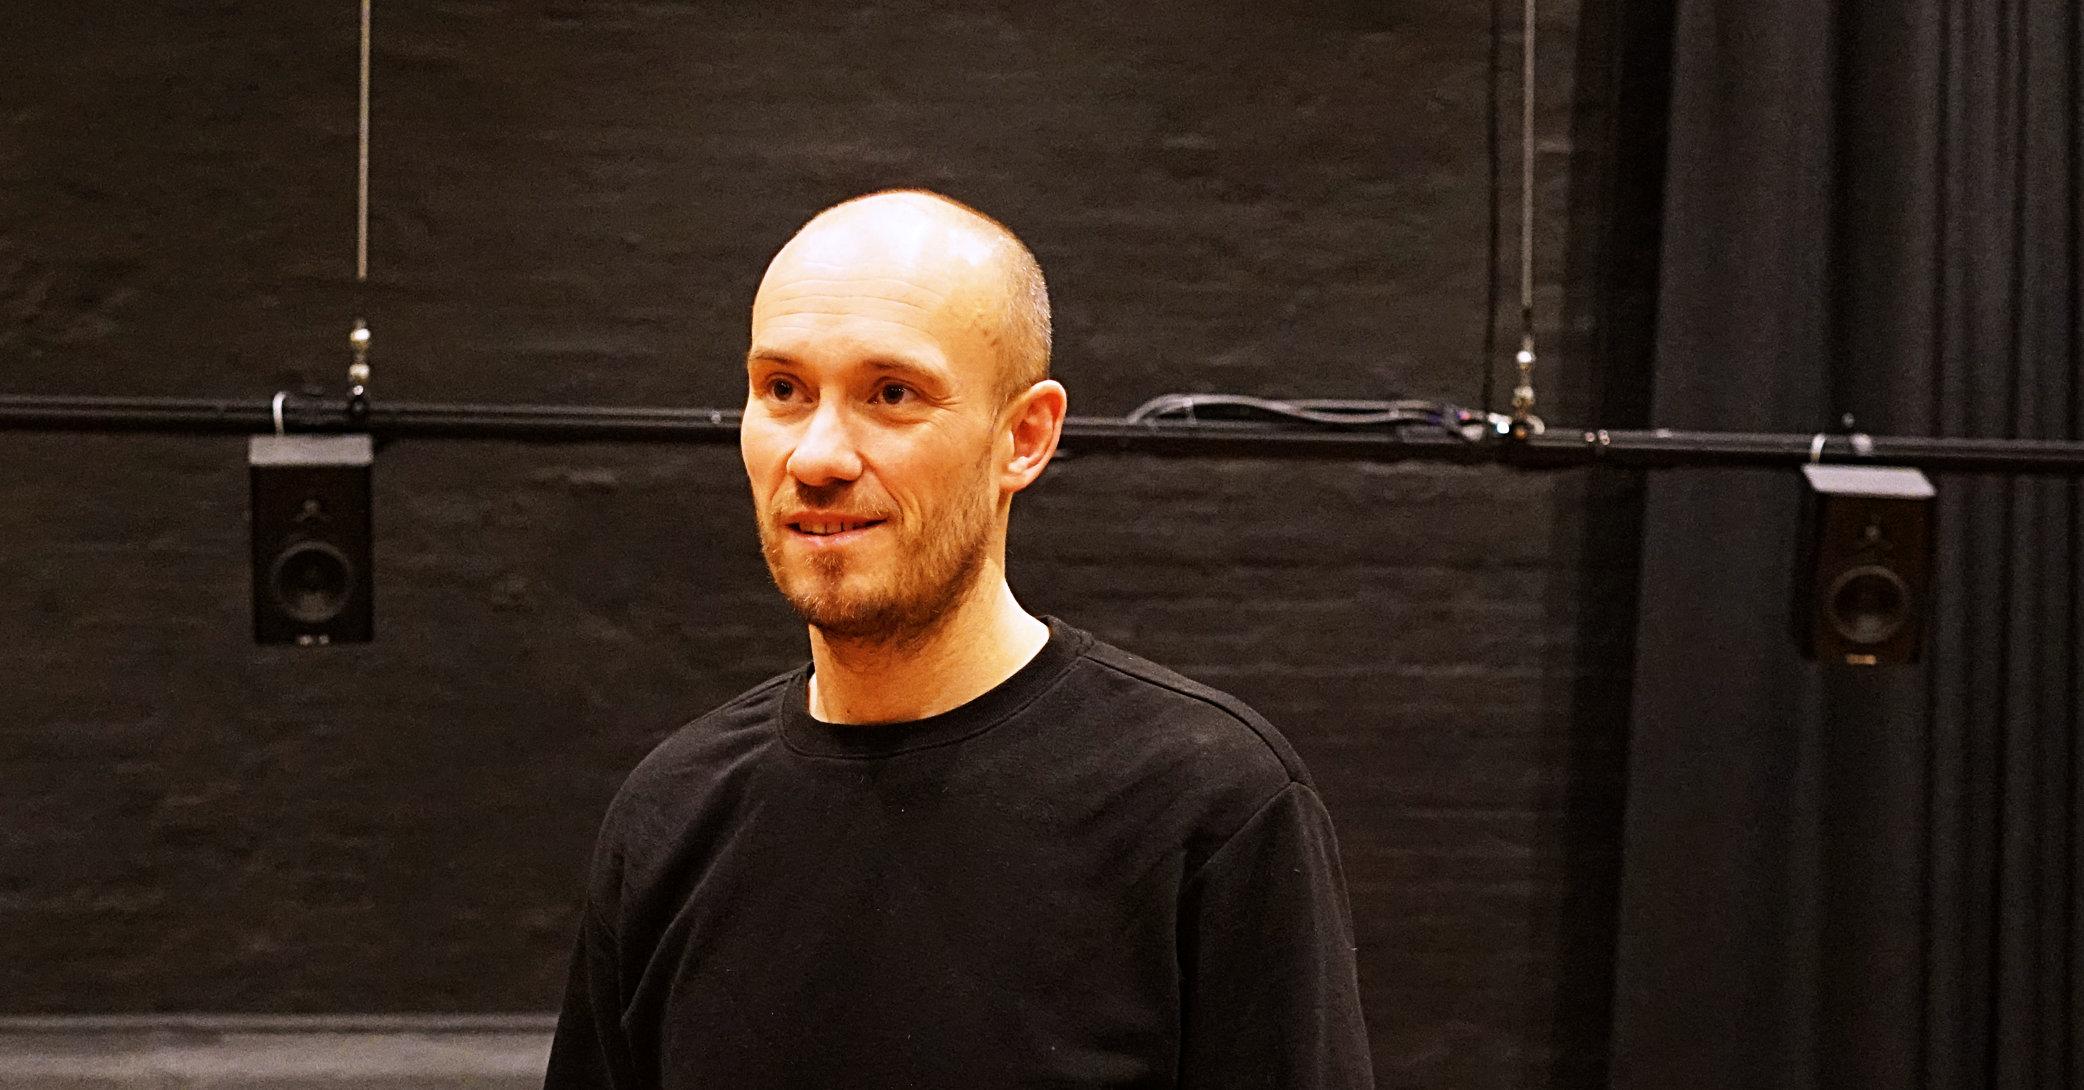 Jesper Andersen, Associate Professor and Head of Tonmeister Studies, at the Royal Danish Academy of Music